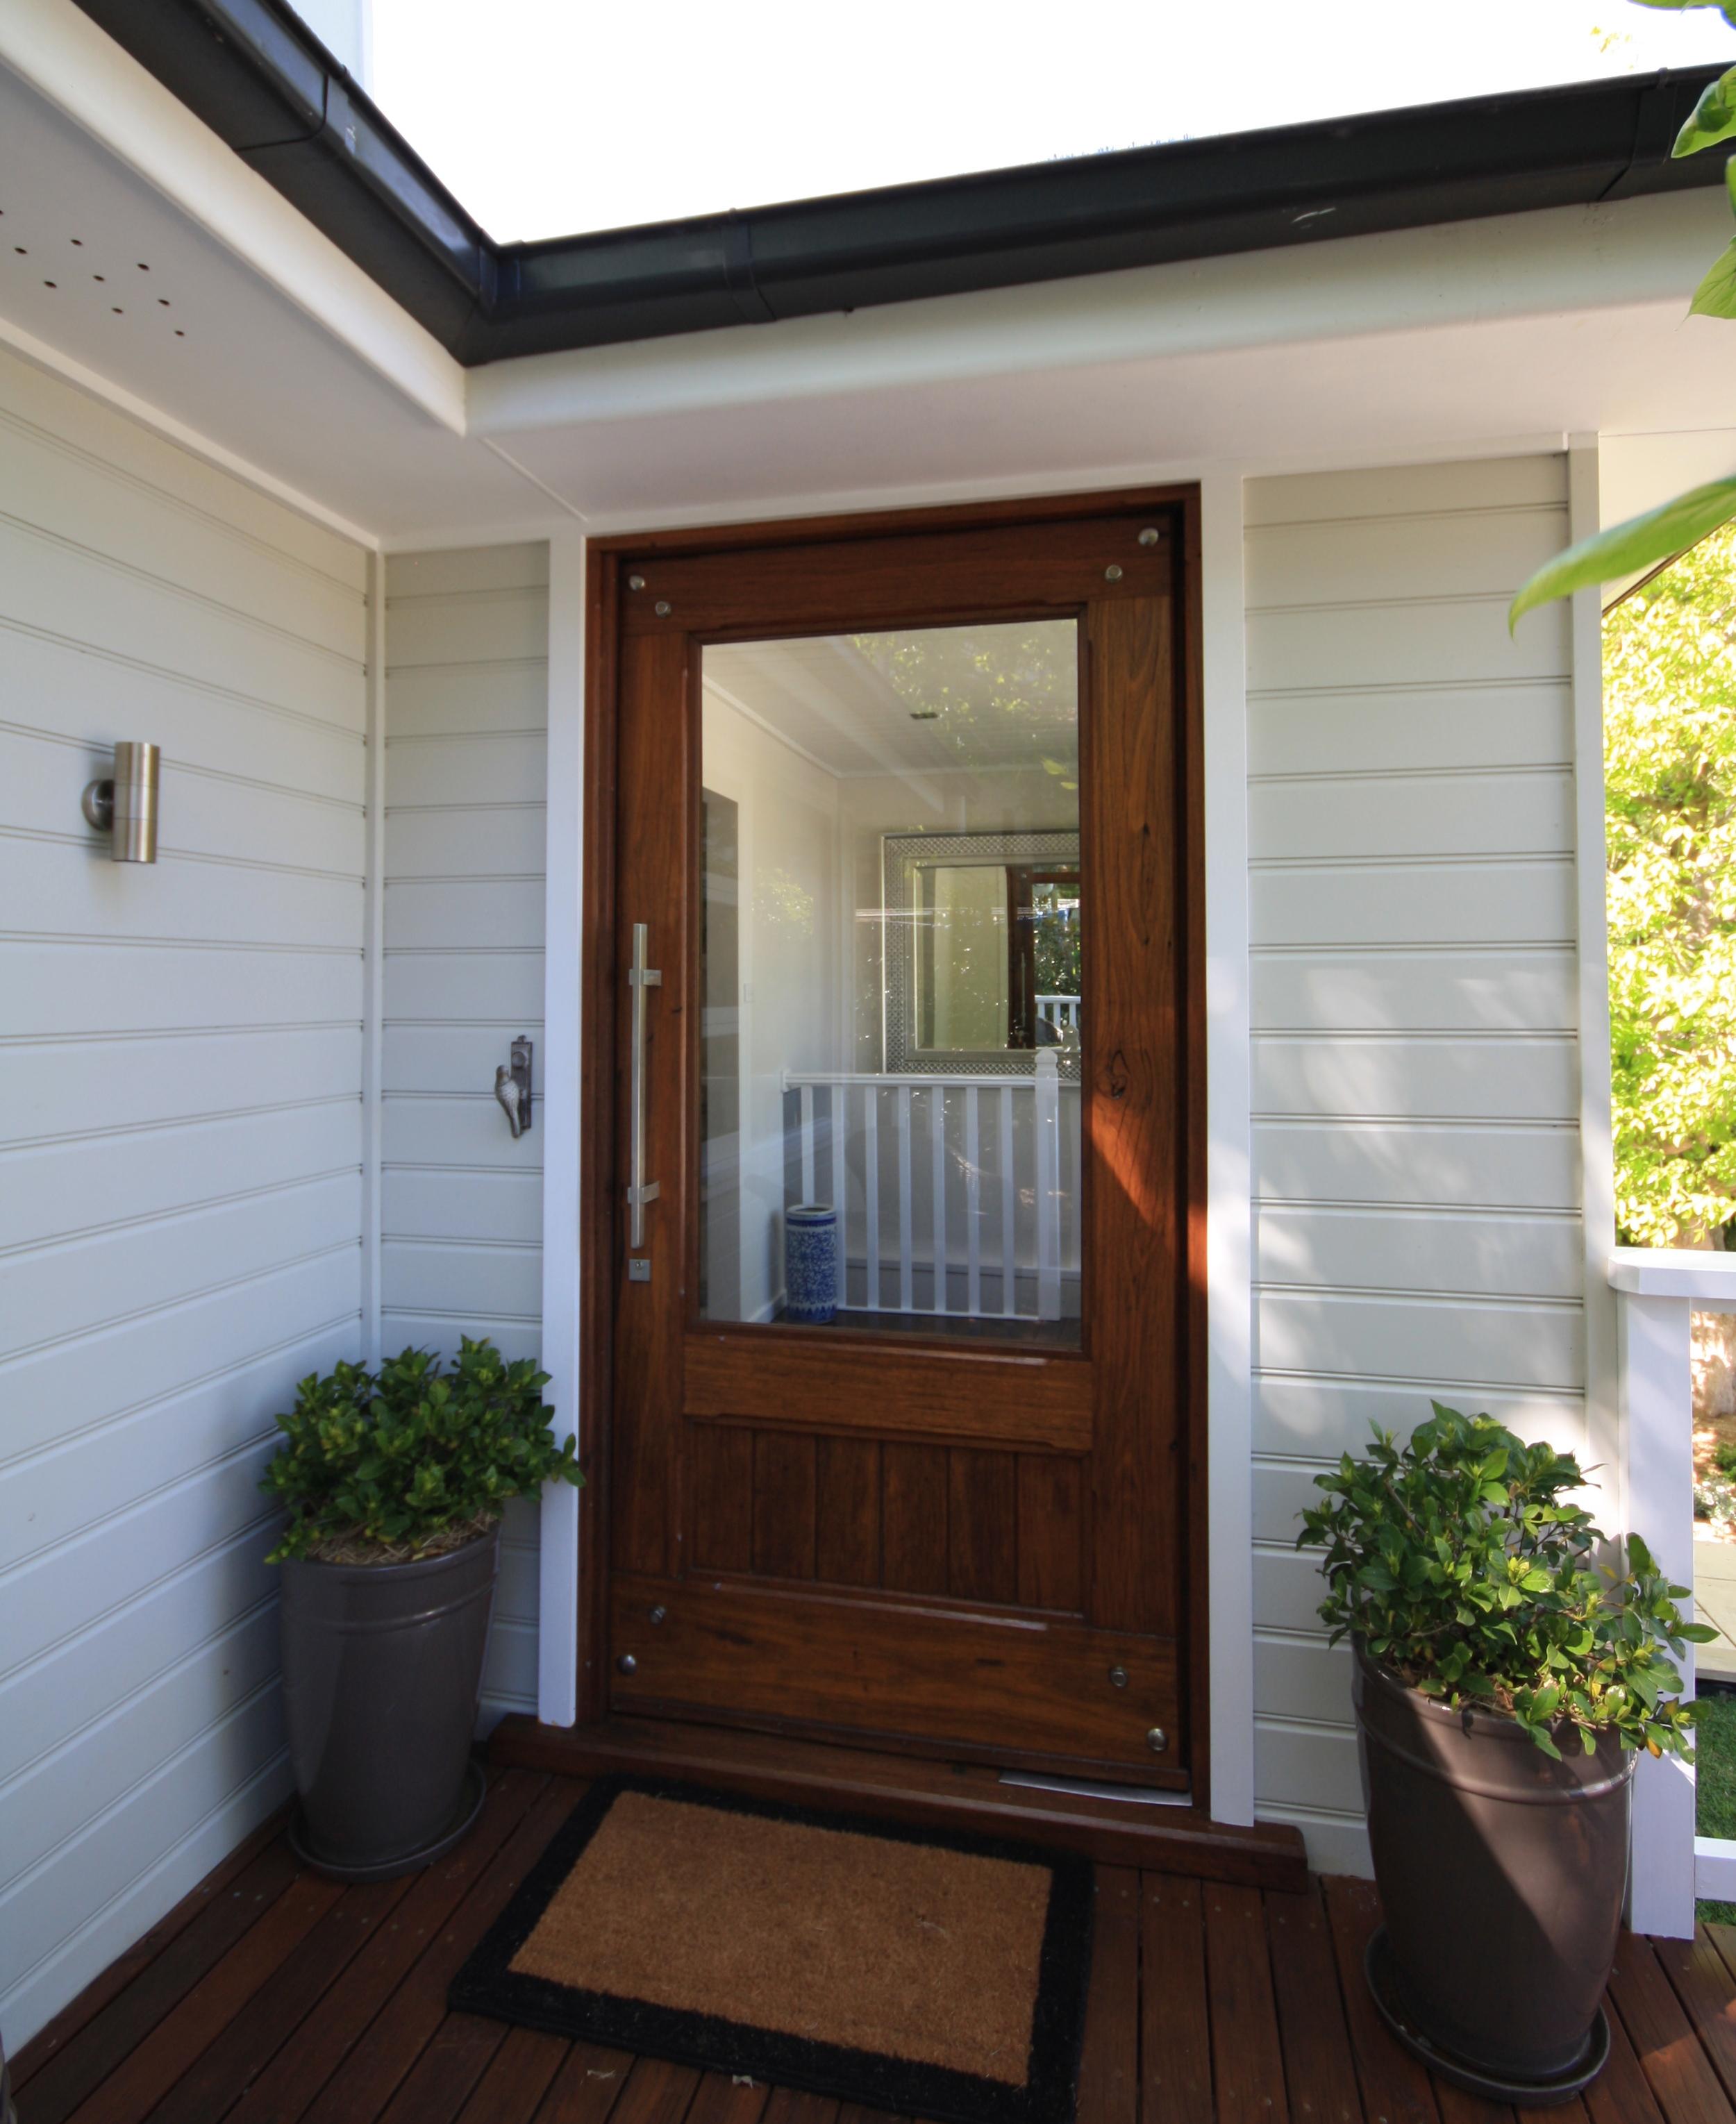 Andrew_Economos_Custom_Builder_Bowral_NSW_Australia_Cottage_33.jpg